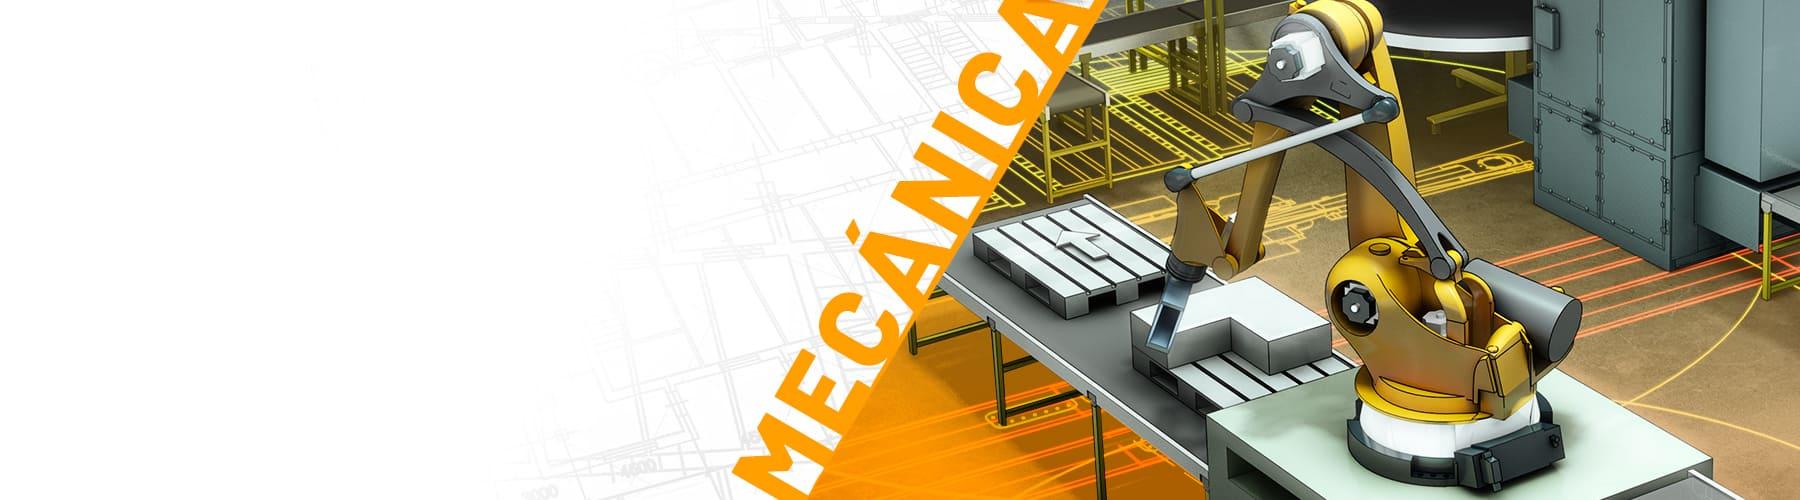 vertical de manufactura semcocad autodesk